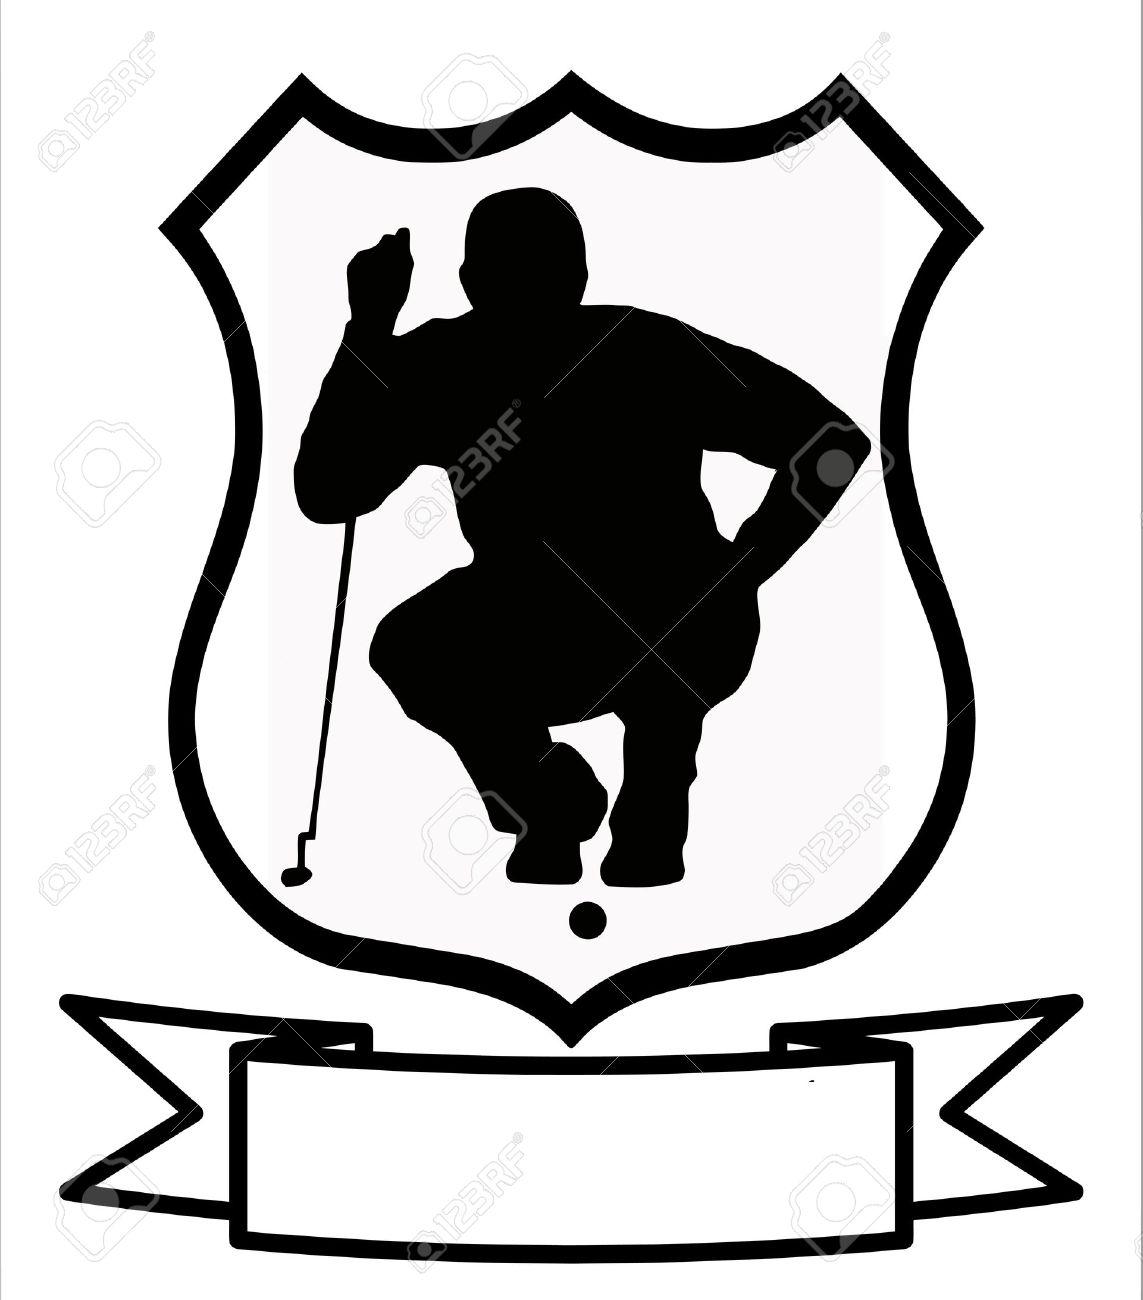 Golf Sport Emblem Badge Shield Logo Insignia Coat of Arms Stock Vector - 10233397